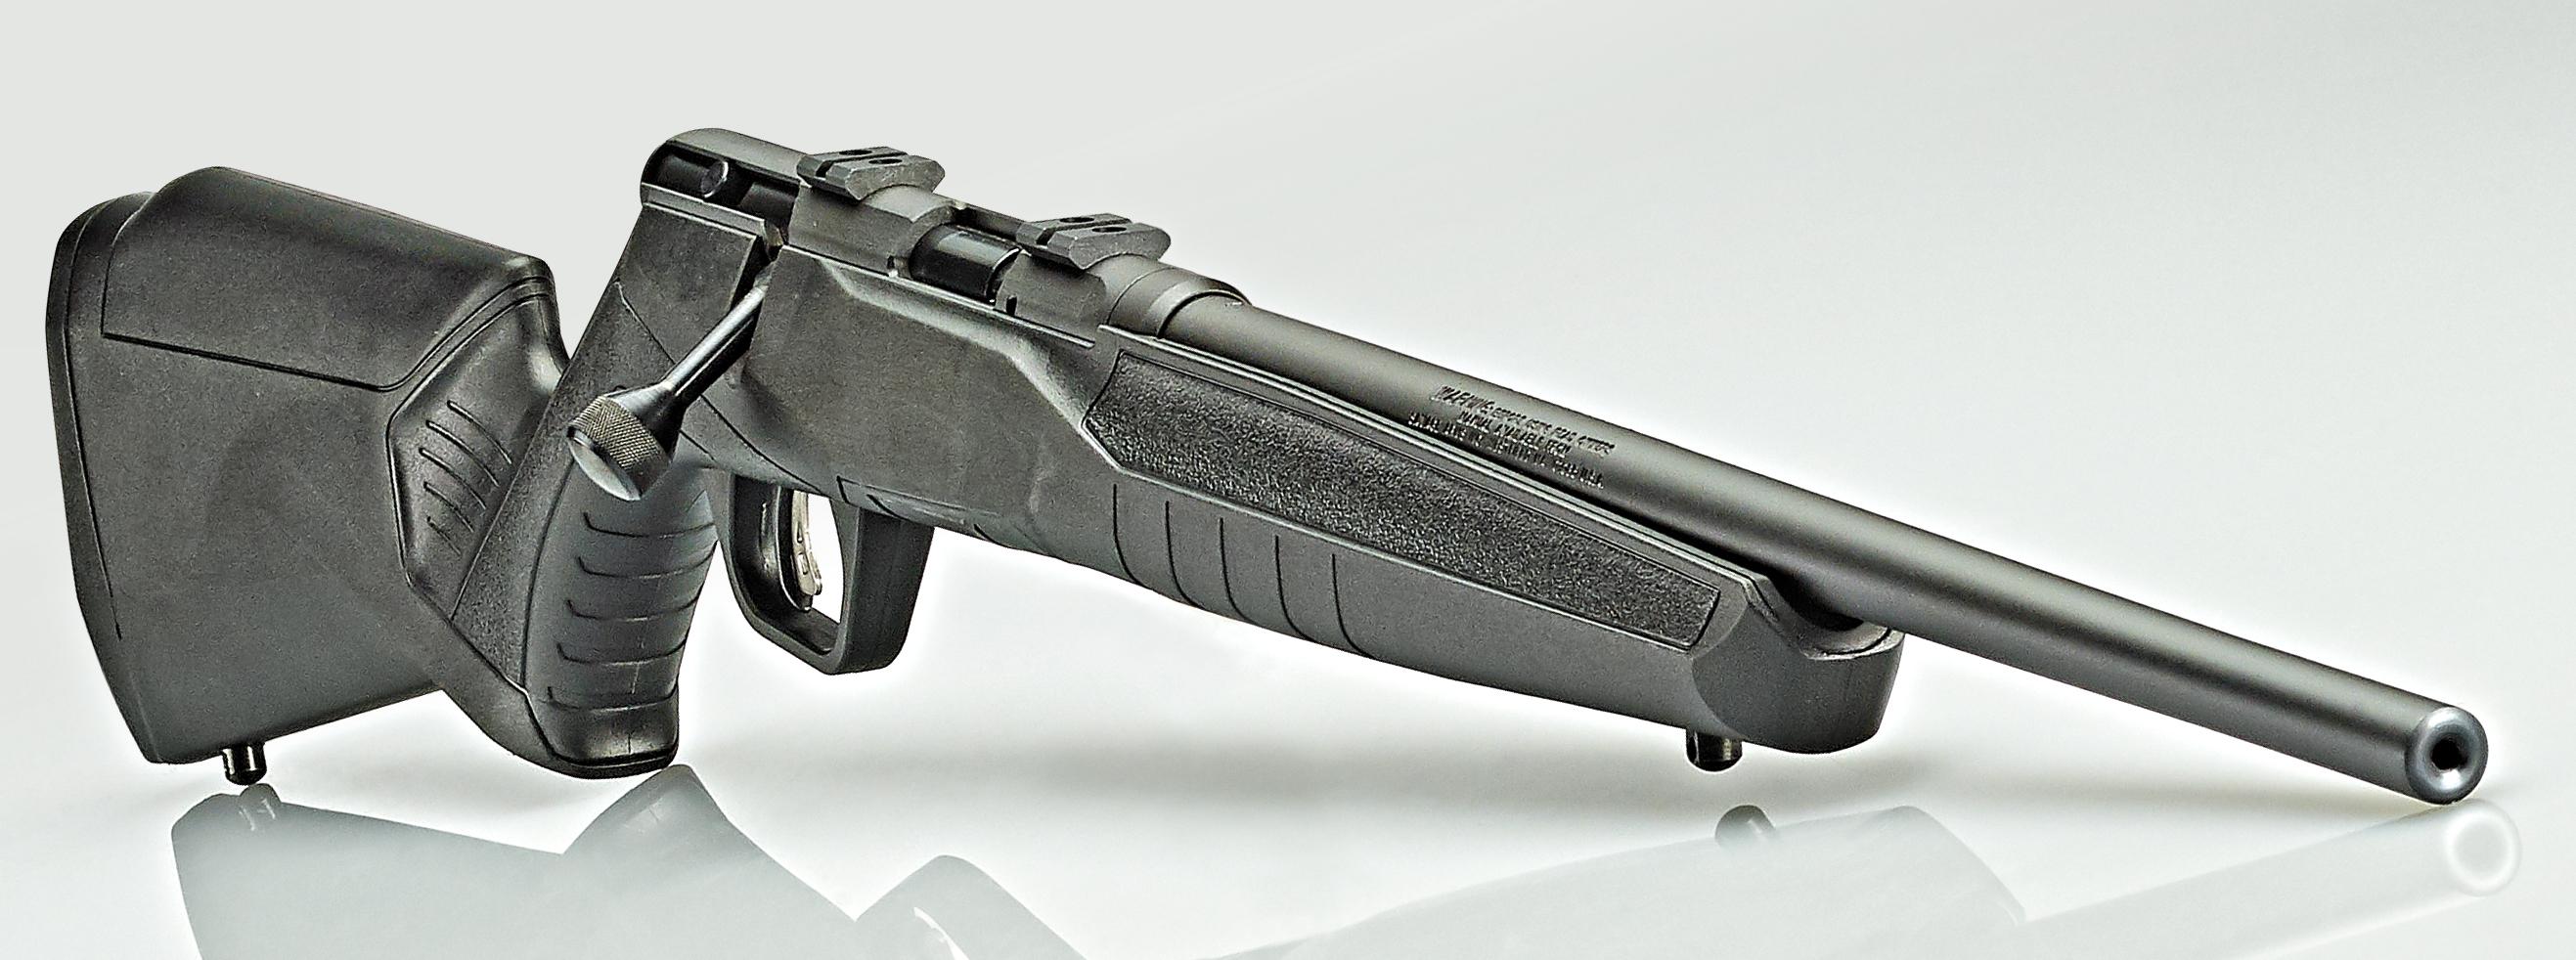 SavageB17 F Compact